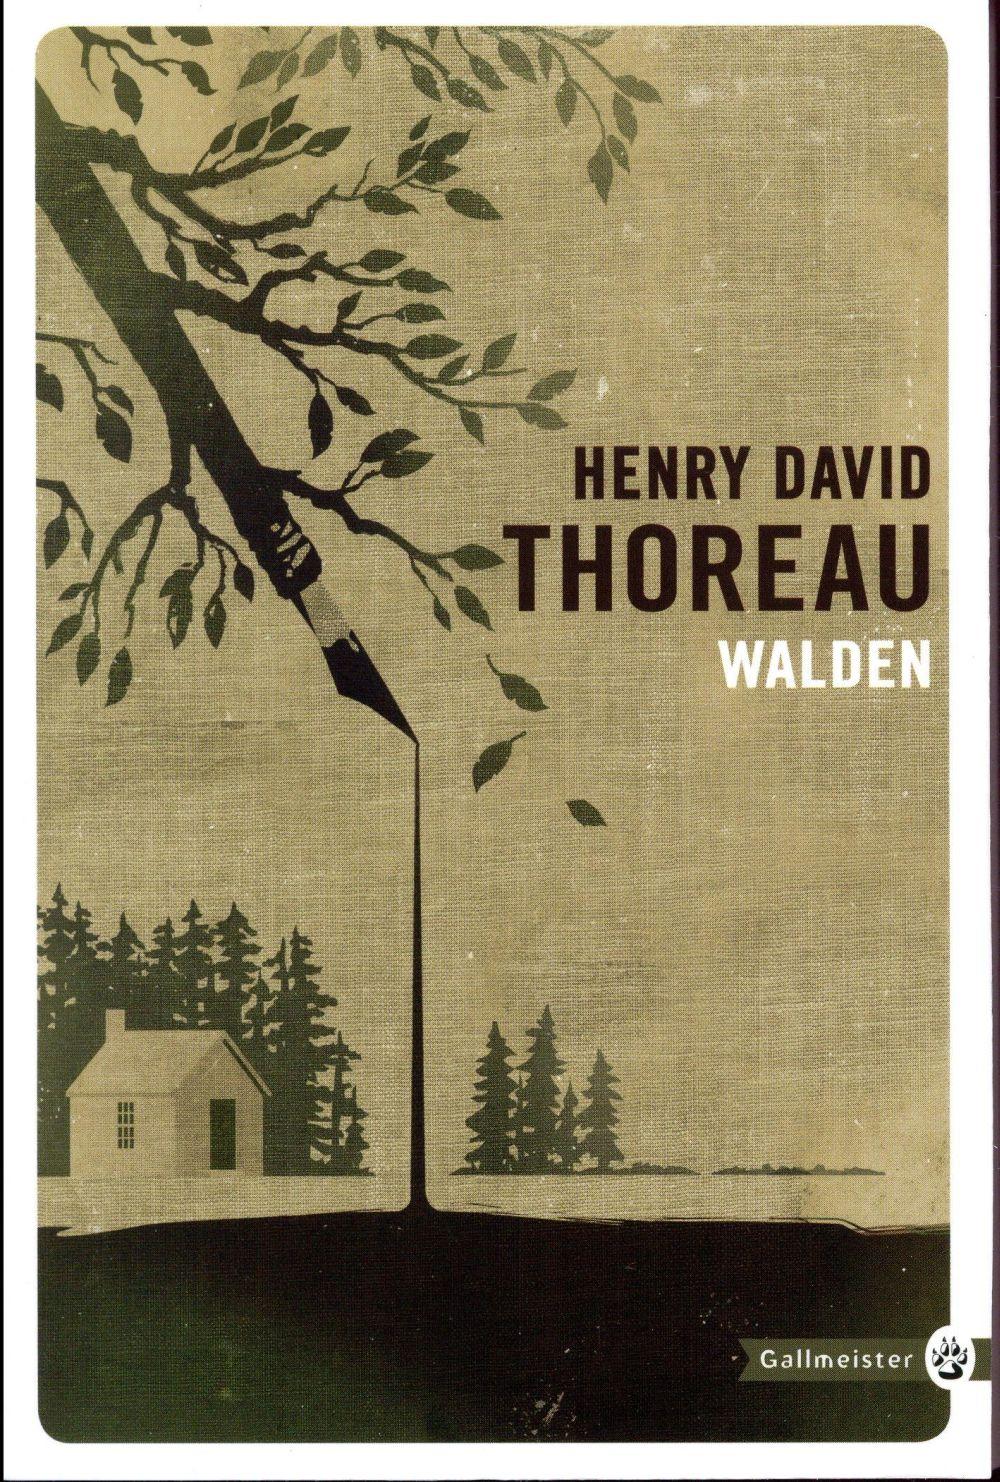 WALDEN THOREAU HENRY DAVID GALLMEISTER